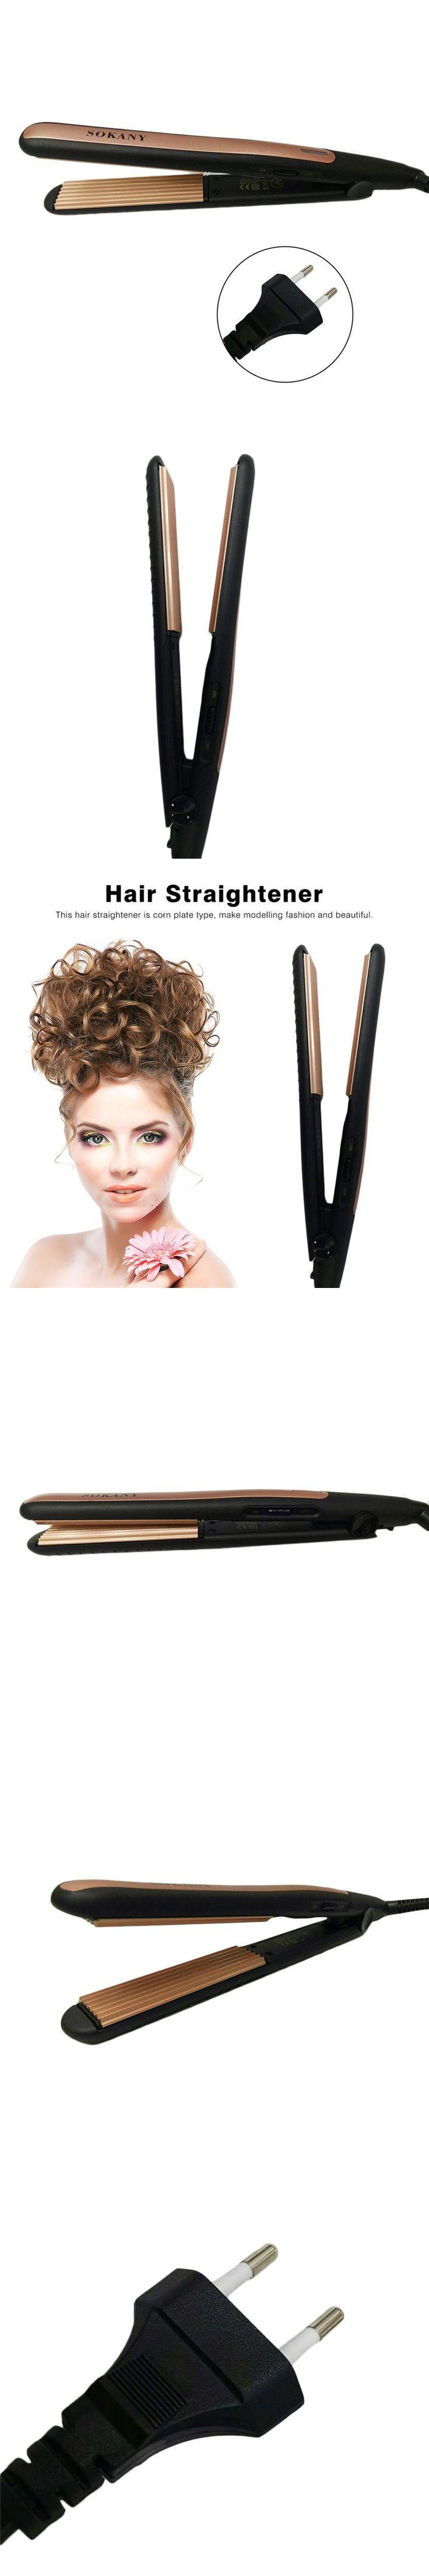 Professional Electric Hair Straightener Curling Hair Salon Straightening Rapid Heating Hair Styling Tool Durable PTC heater